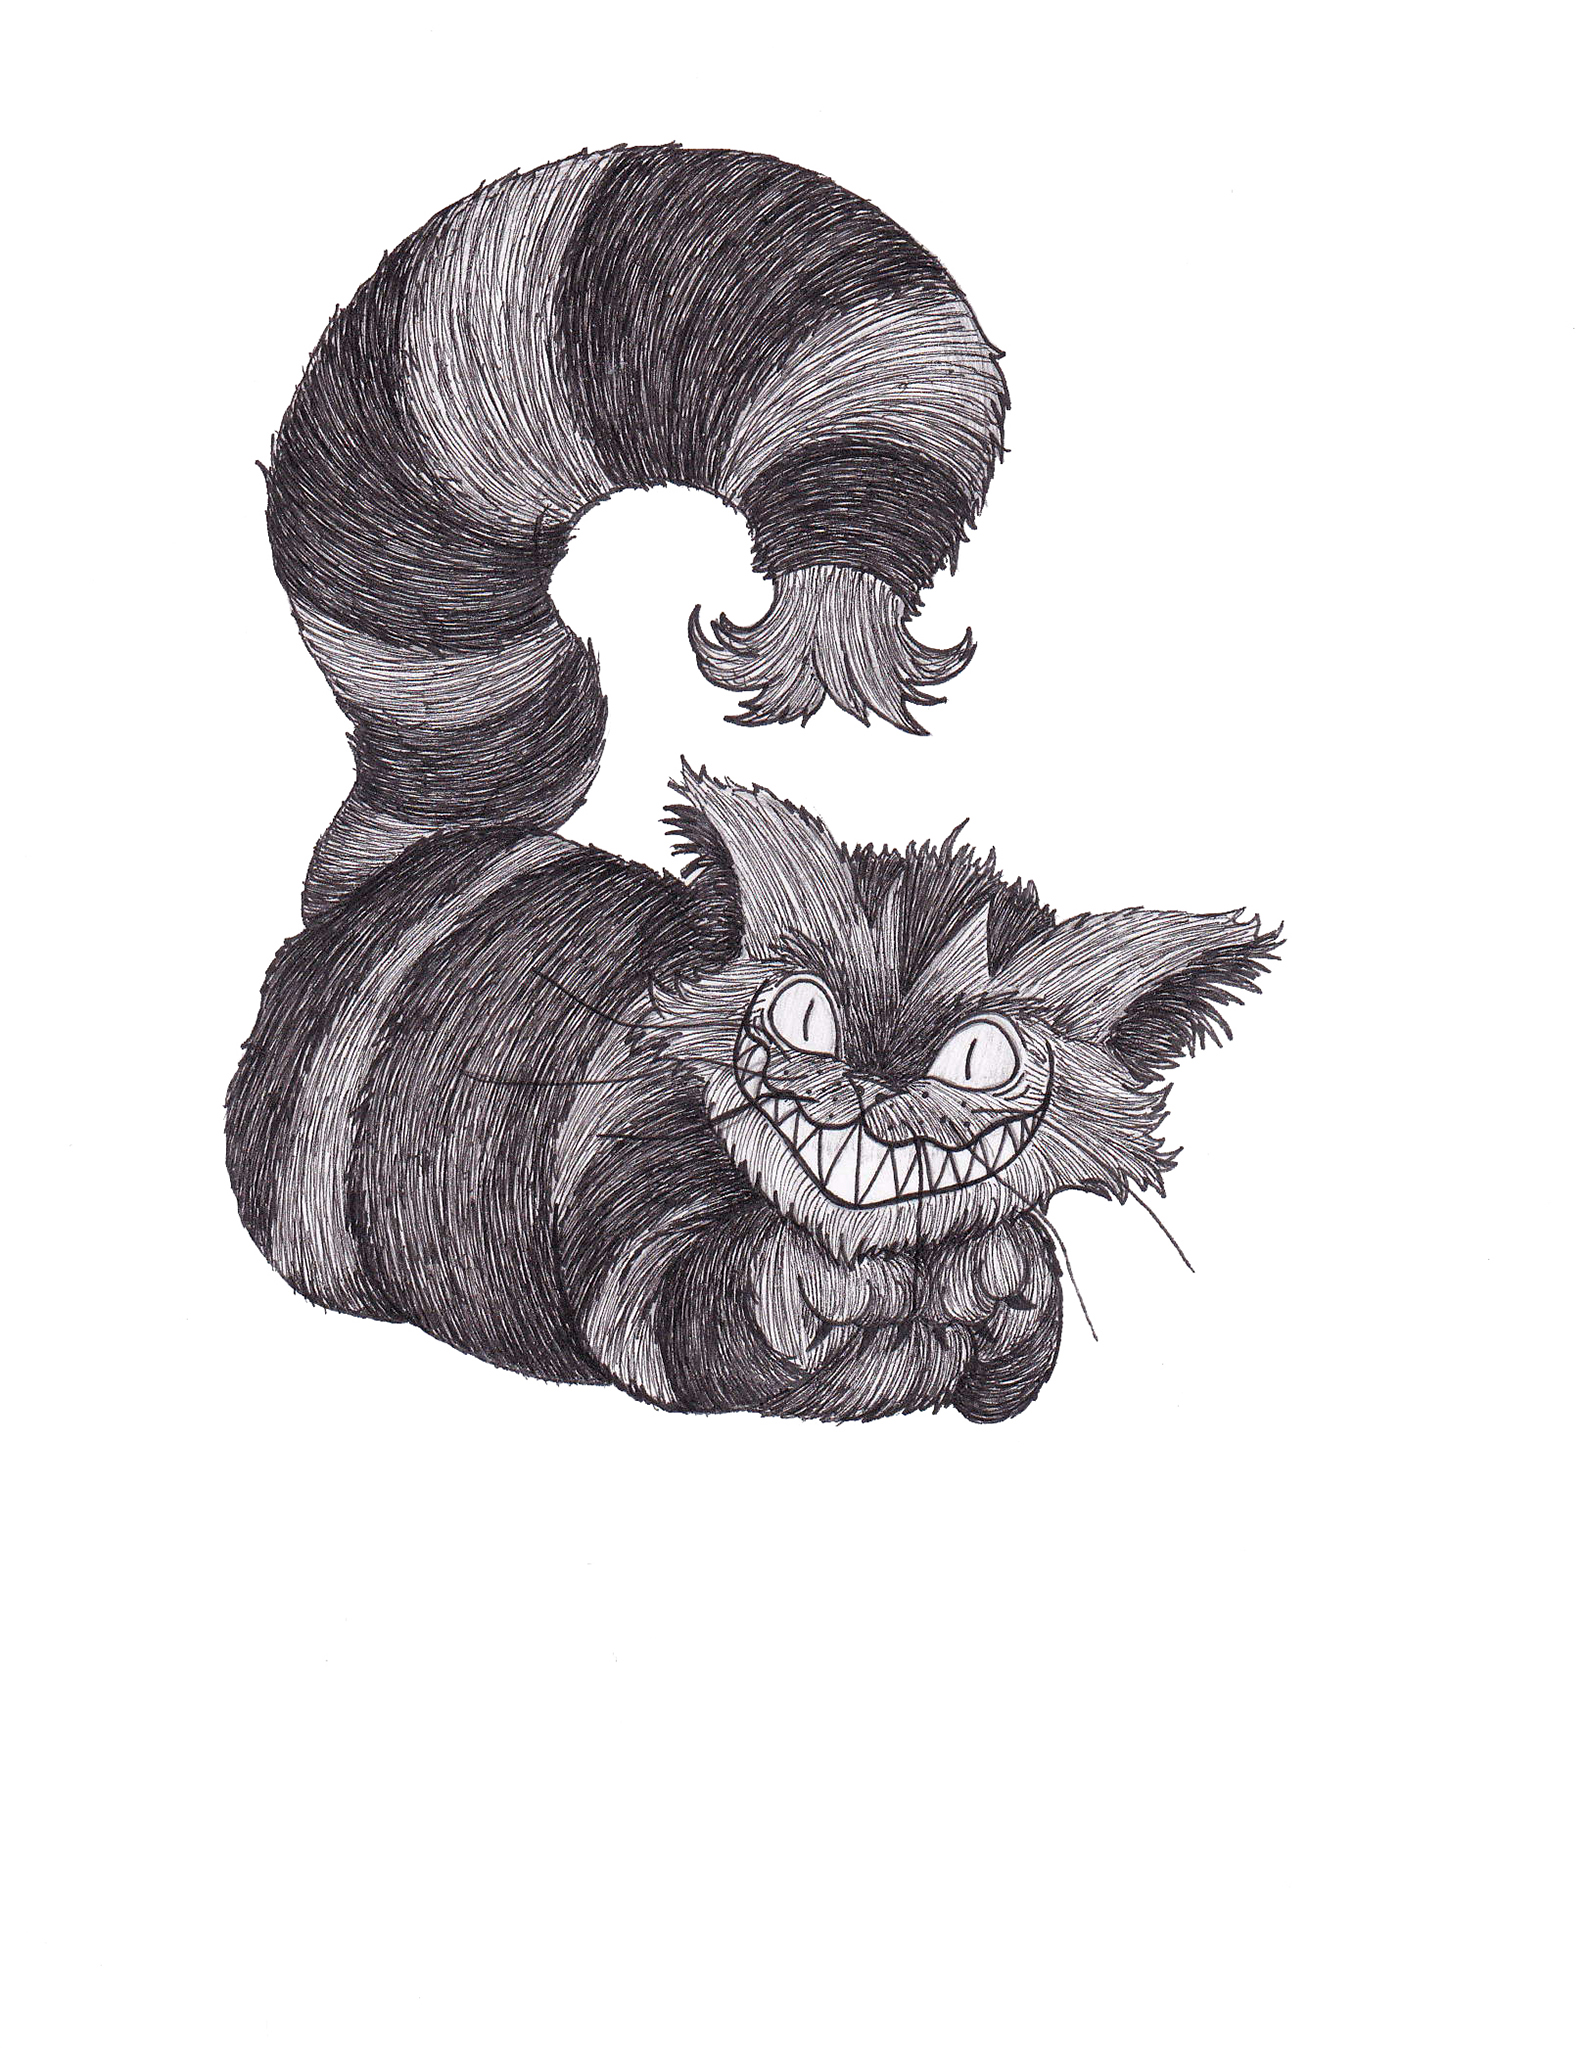 Lauren Elizabeth Osborne Illustration and Design